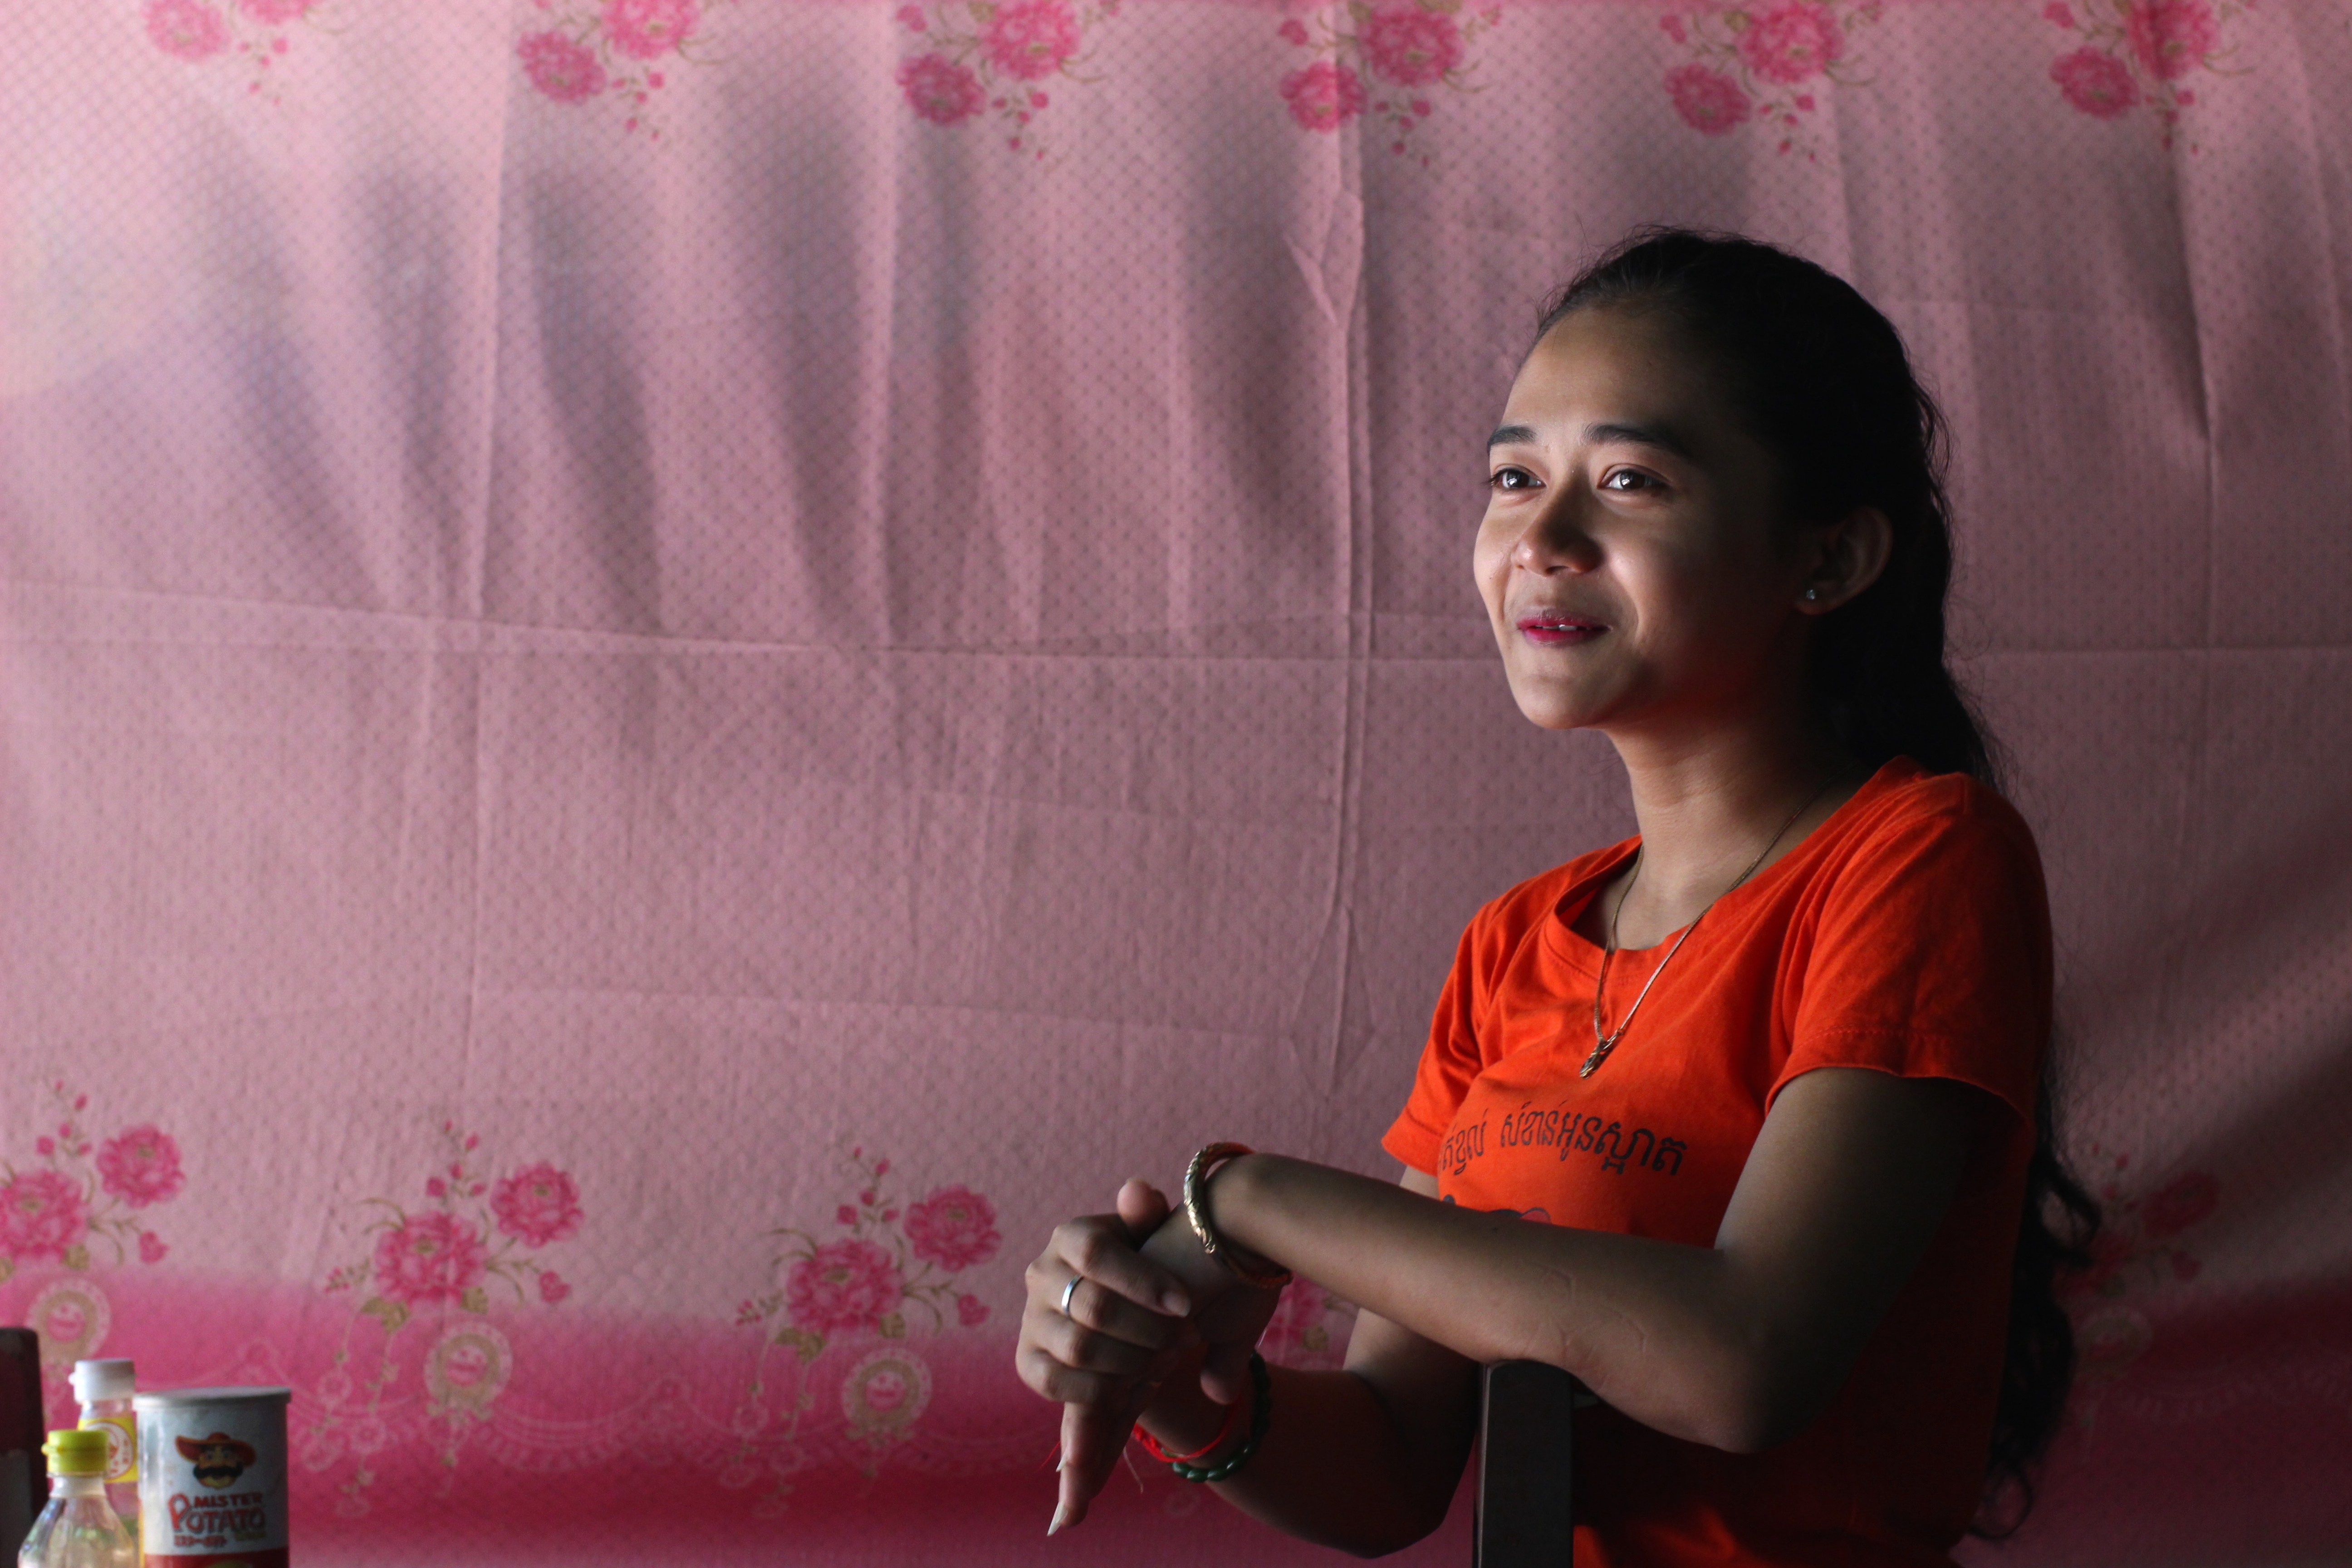 khmer we can 798.JPG